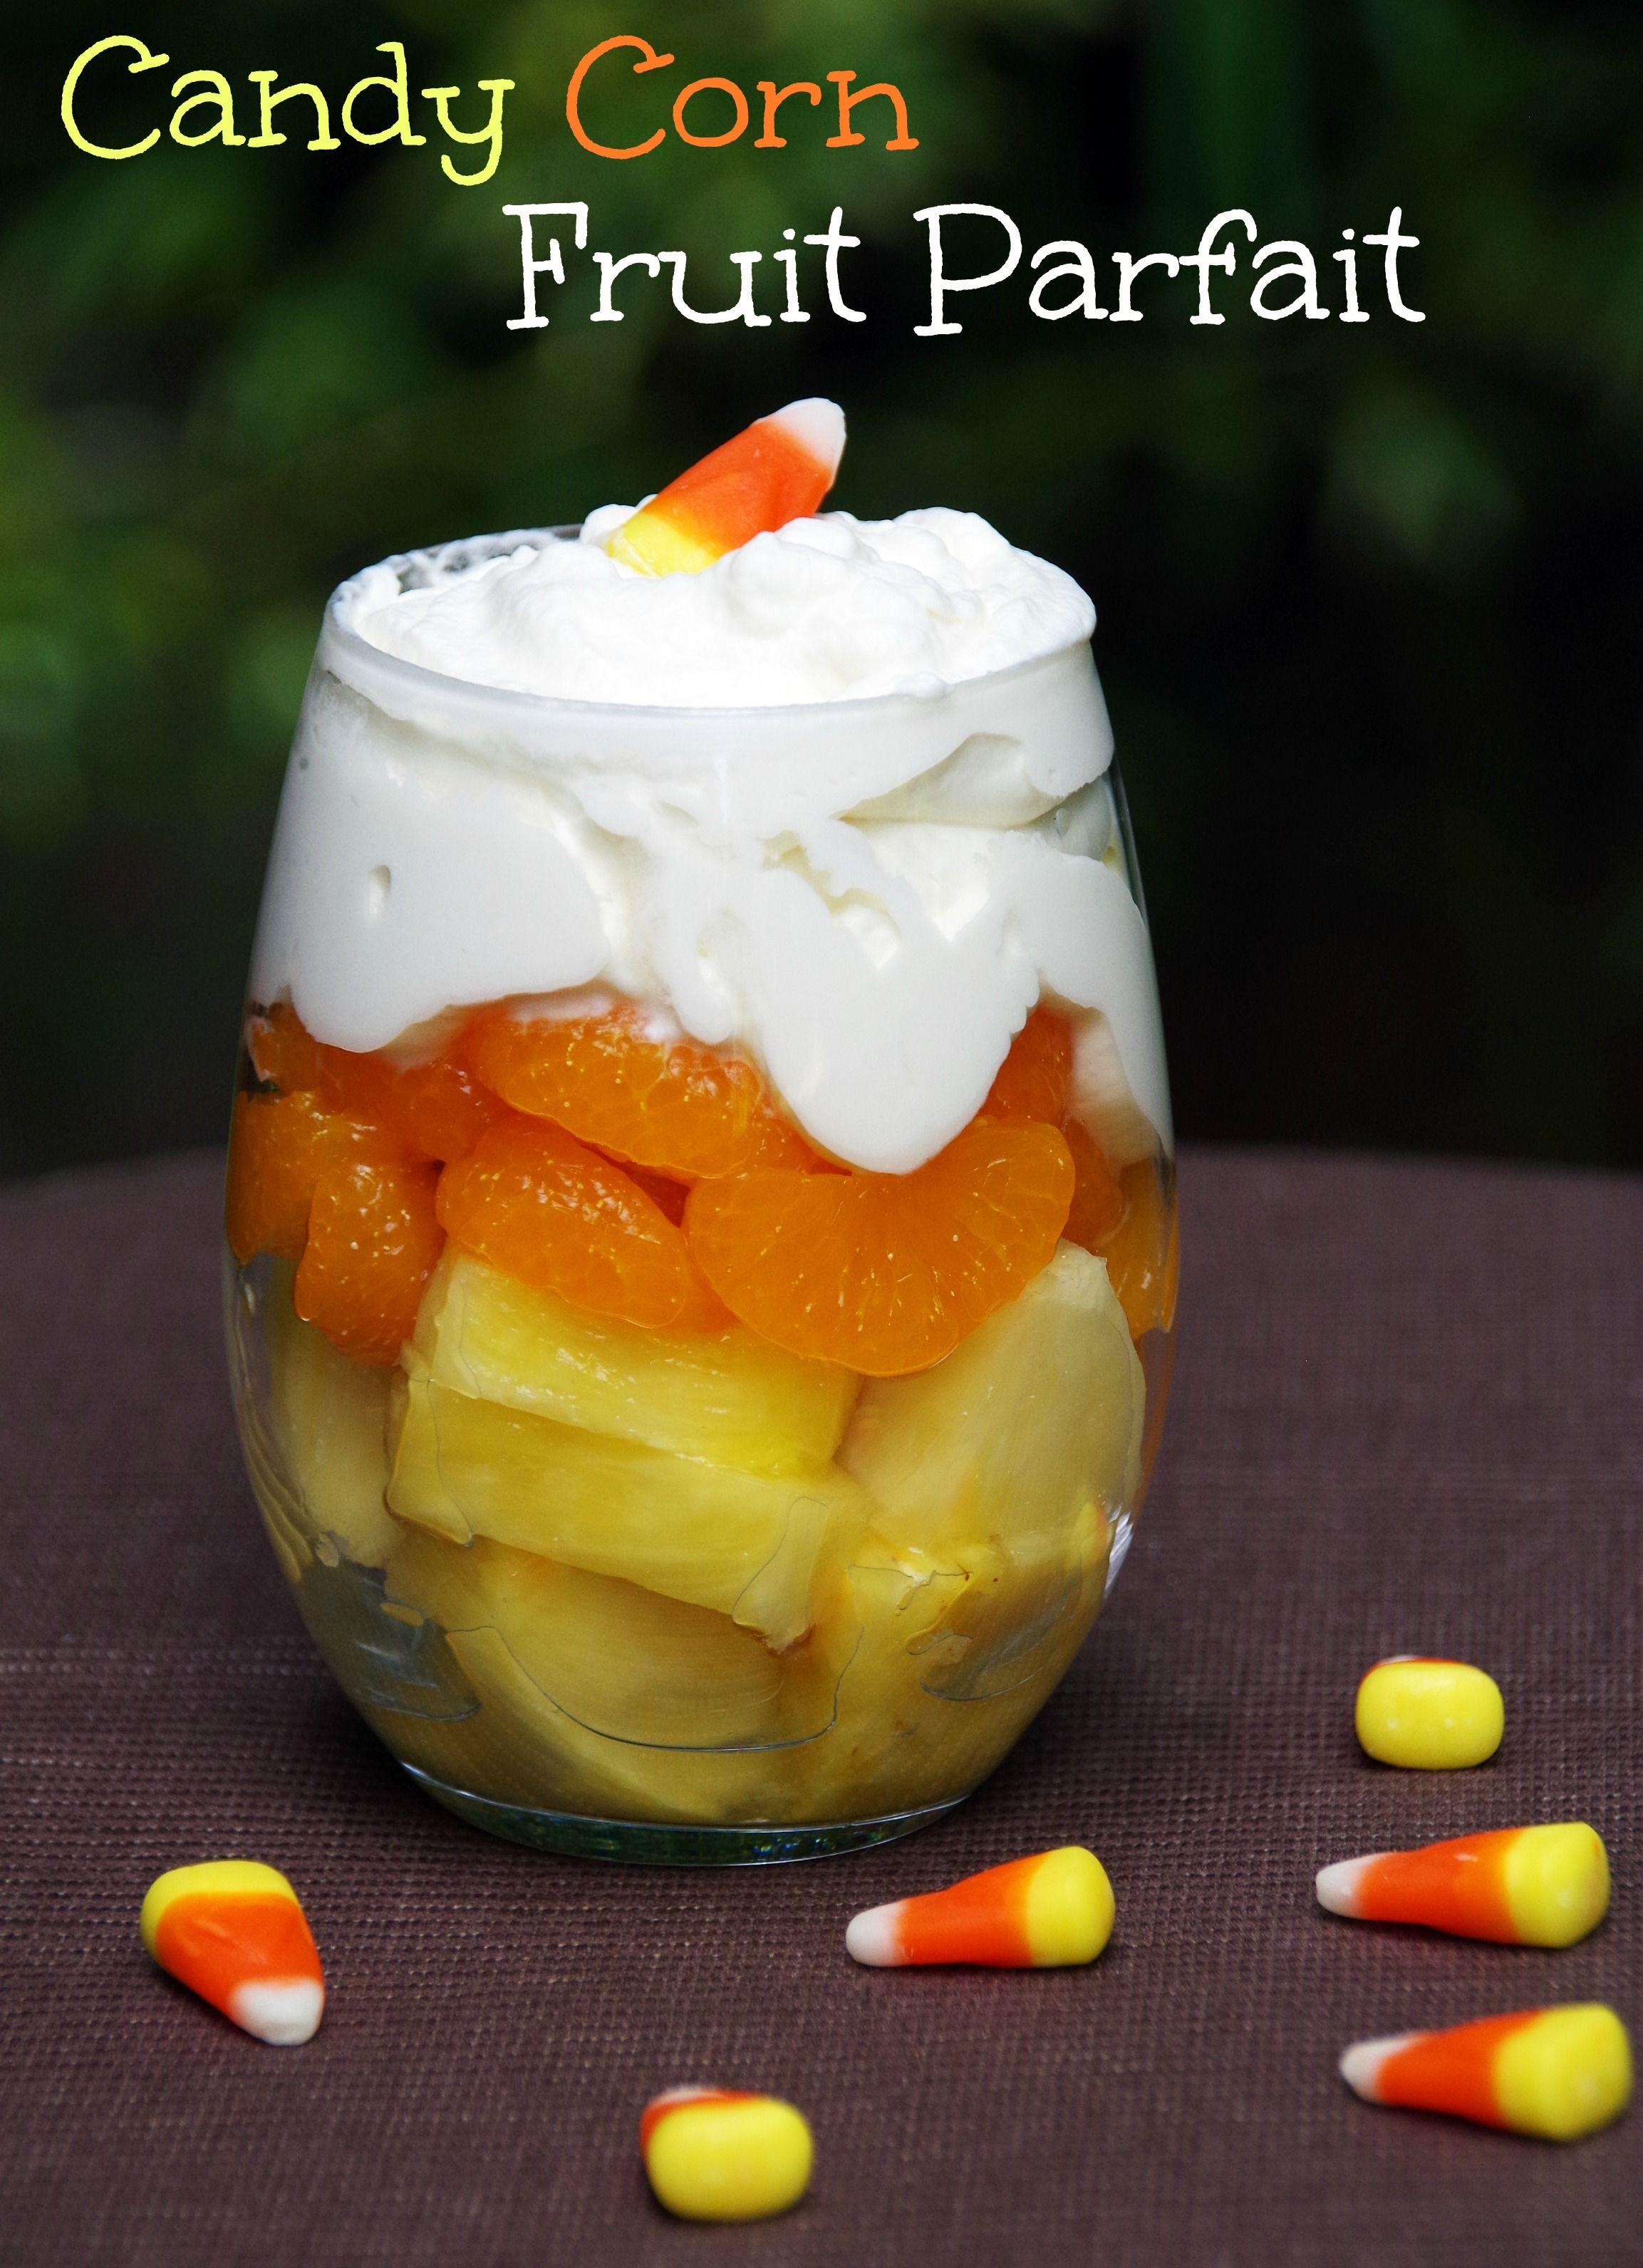 Healthy Halloween Dessert: Candy Corn Fruit Parfait